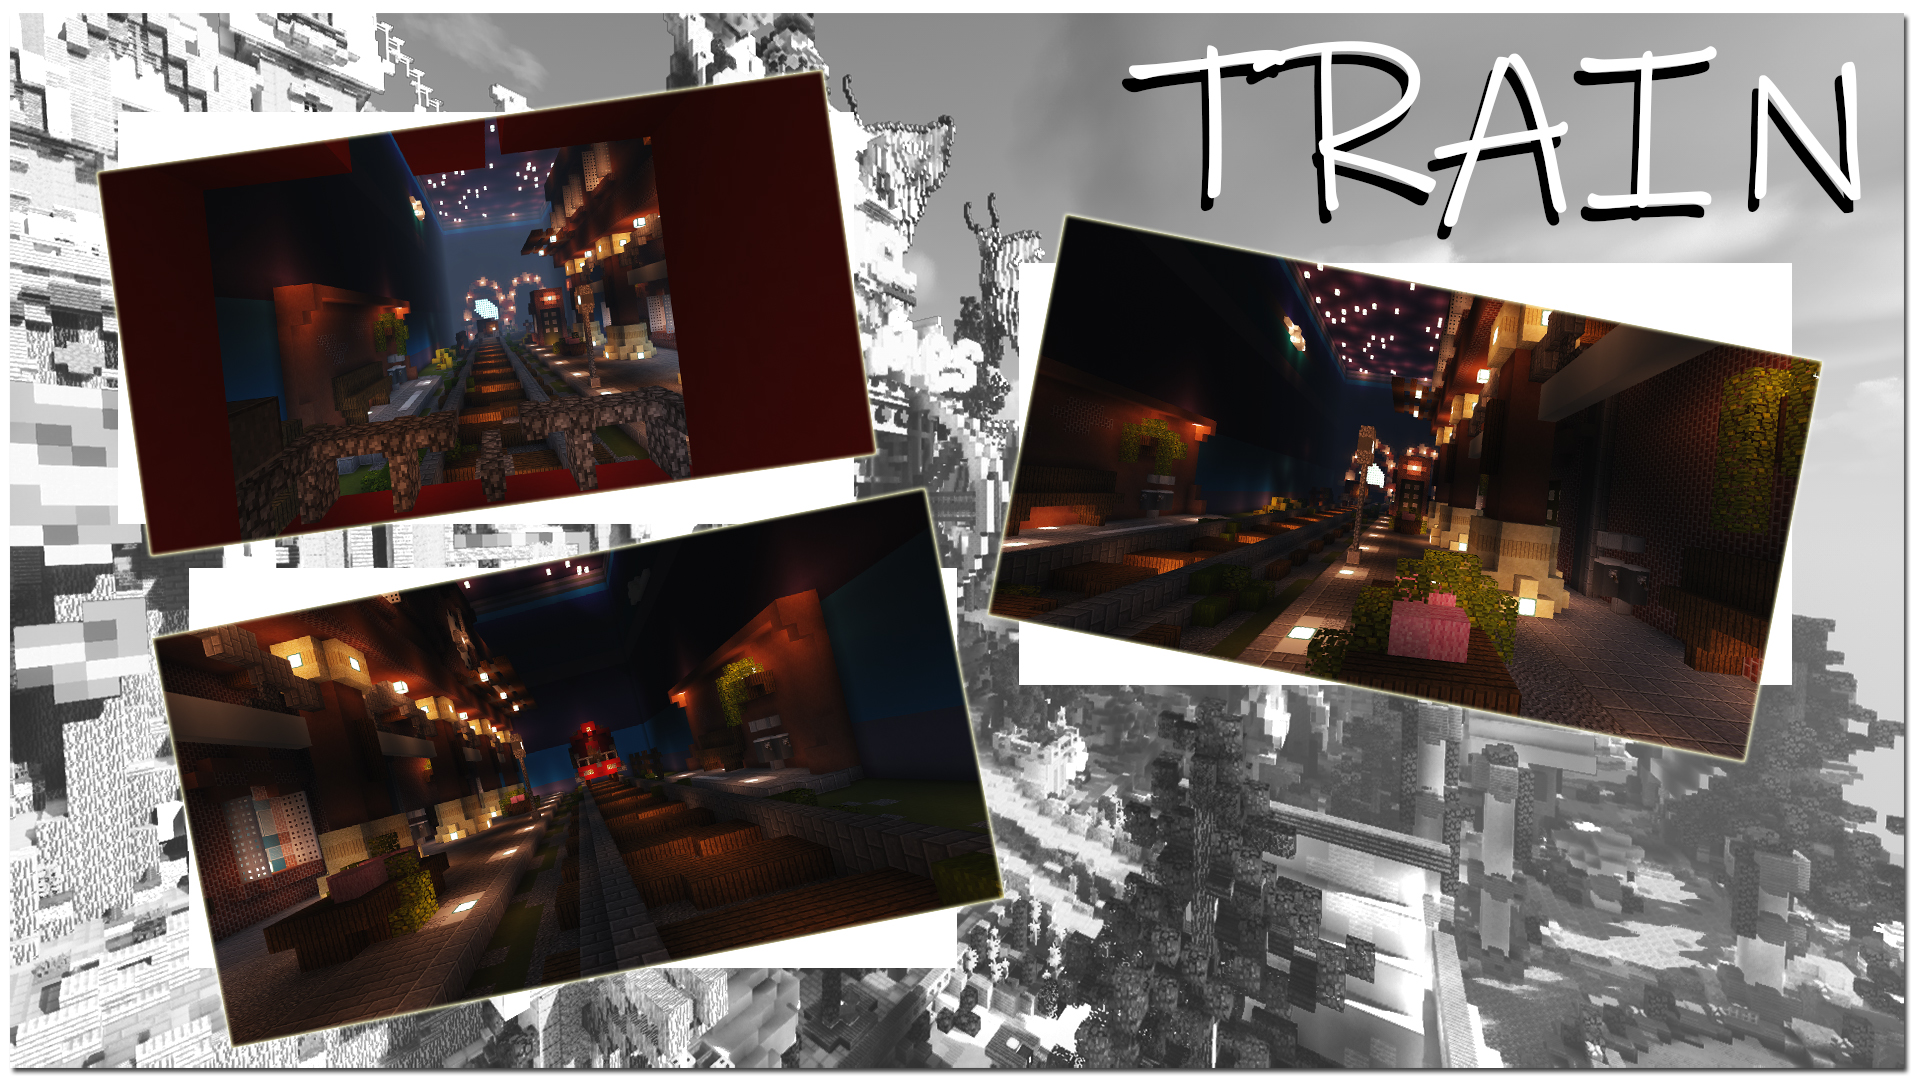 map train.jpg